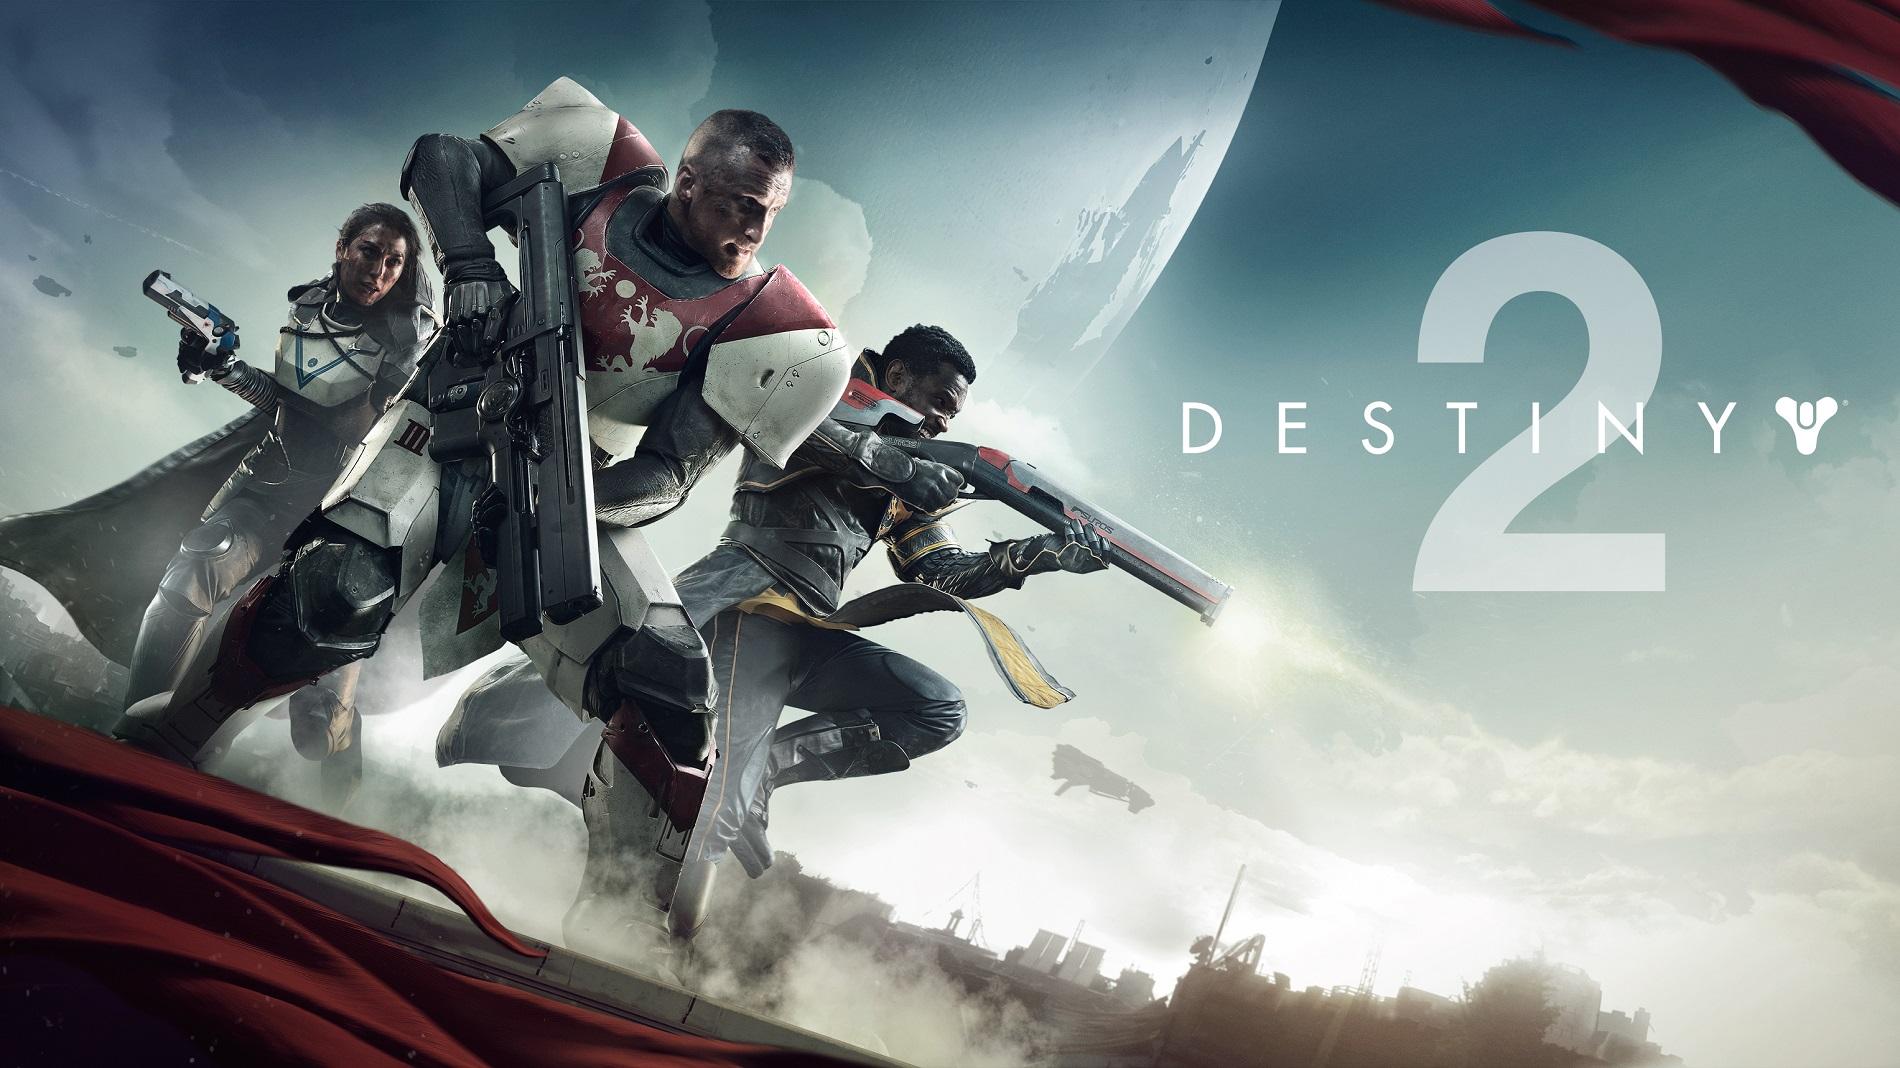 Destiny 2 - Best of E3 2017 - Bronze